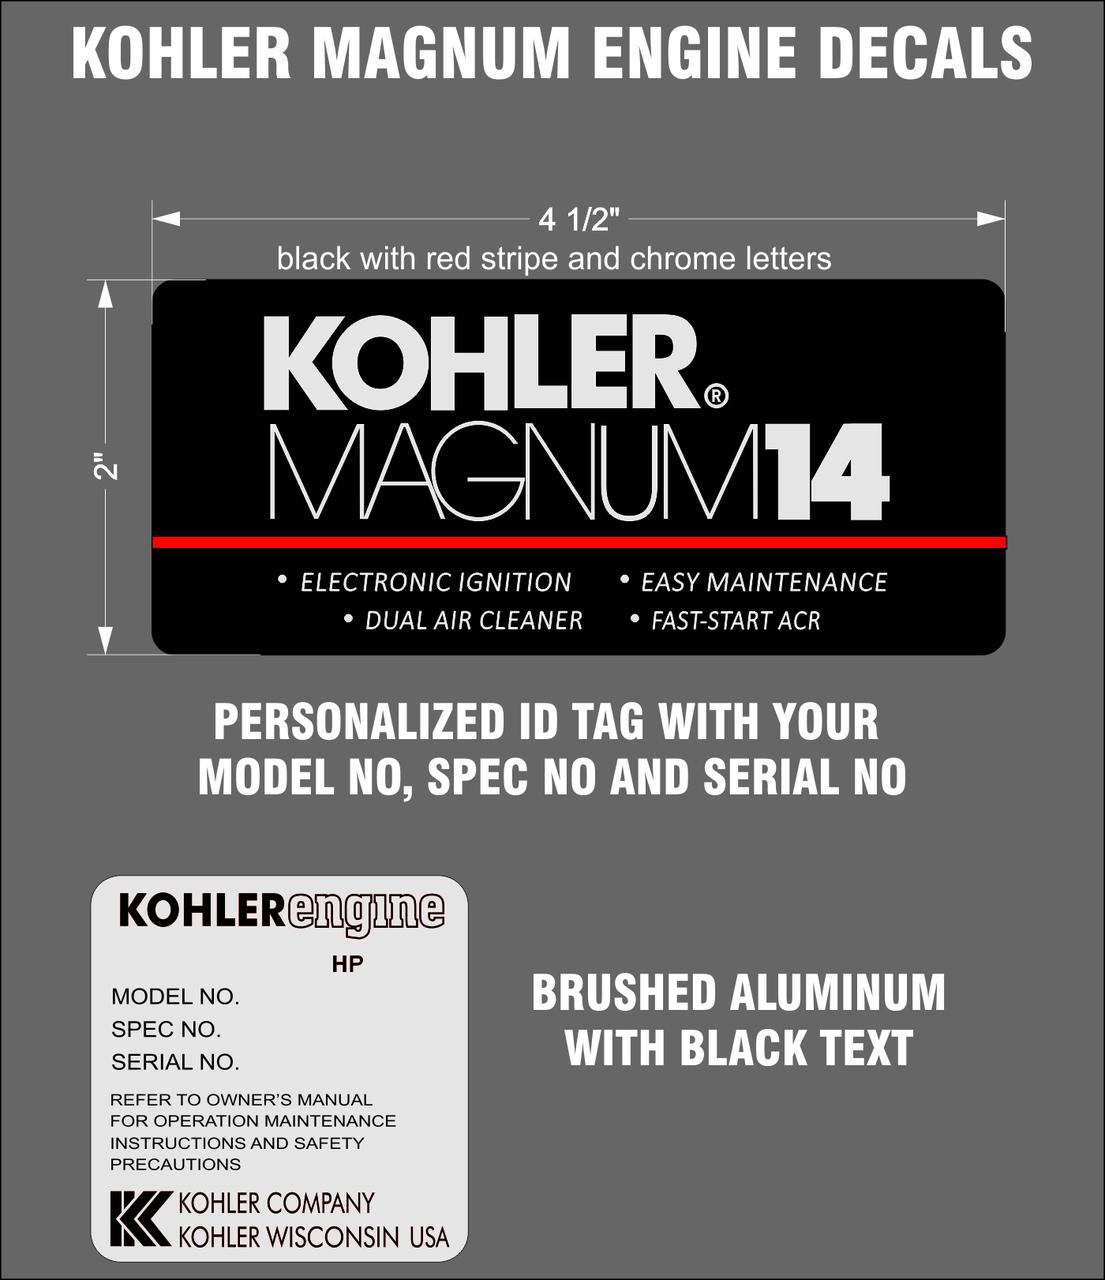 KOHLER MAGNUM ENGINE REPRODUCTION DECALS